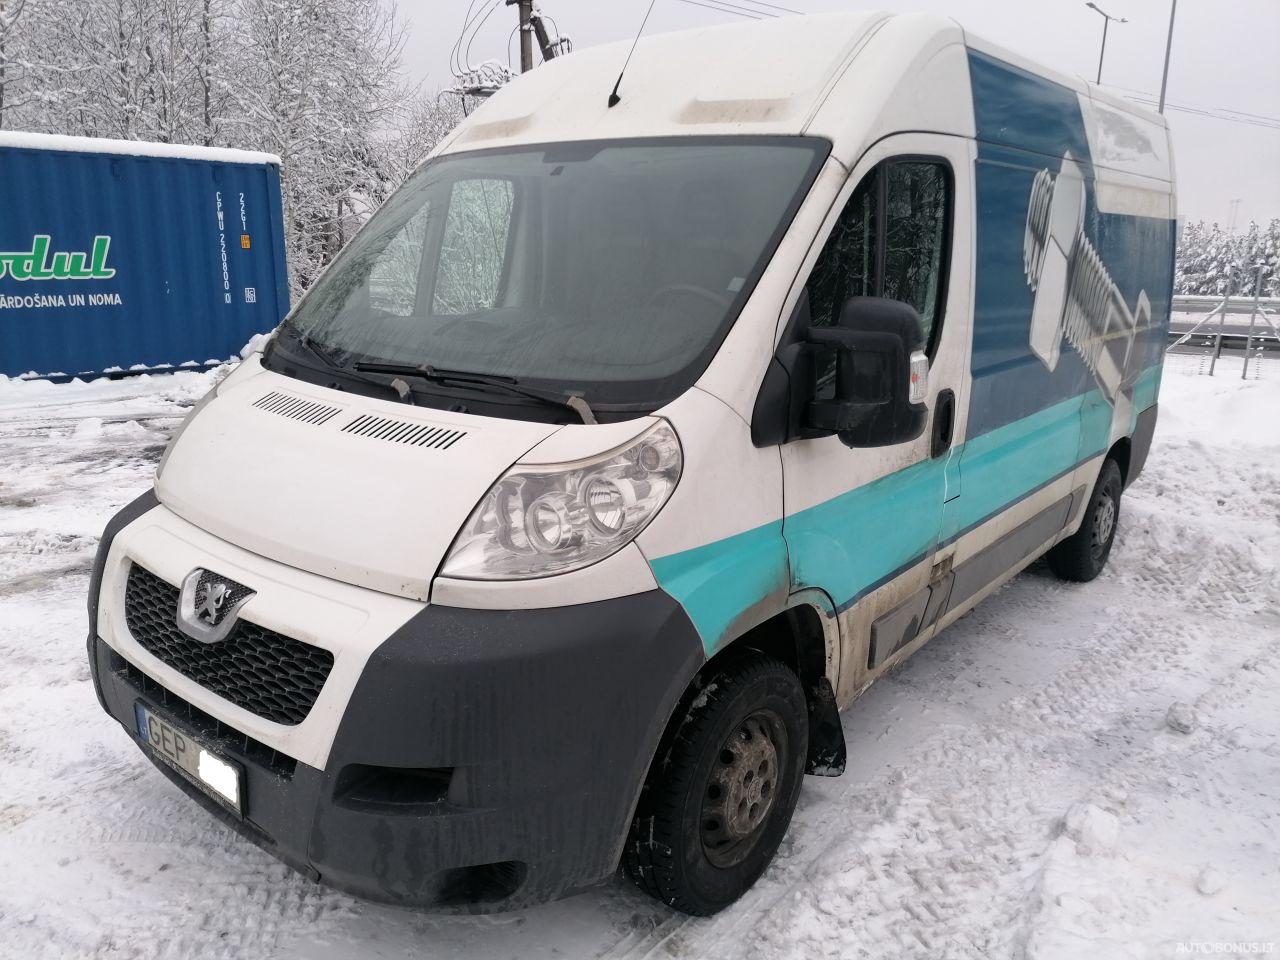 Peugeot BOXER, Krovininiai iki 3,5 t